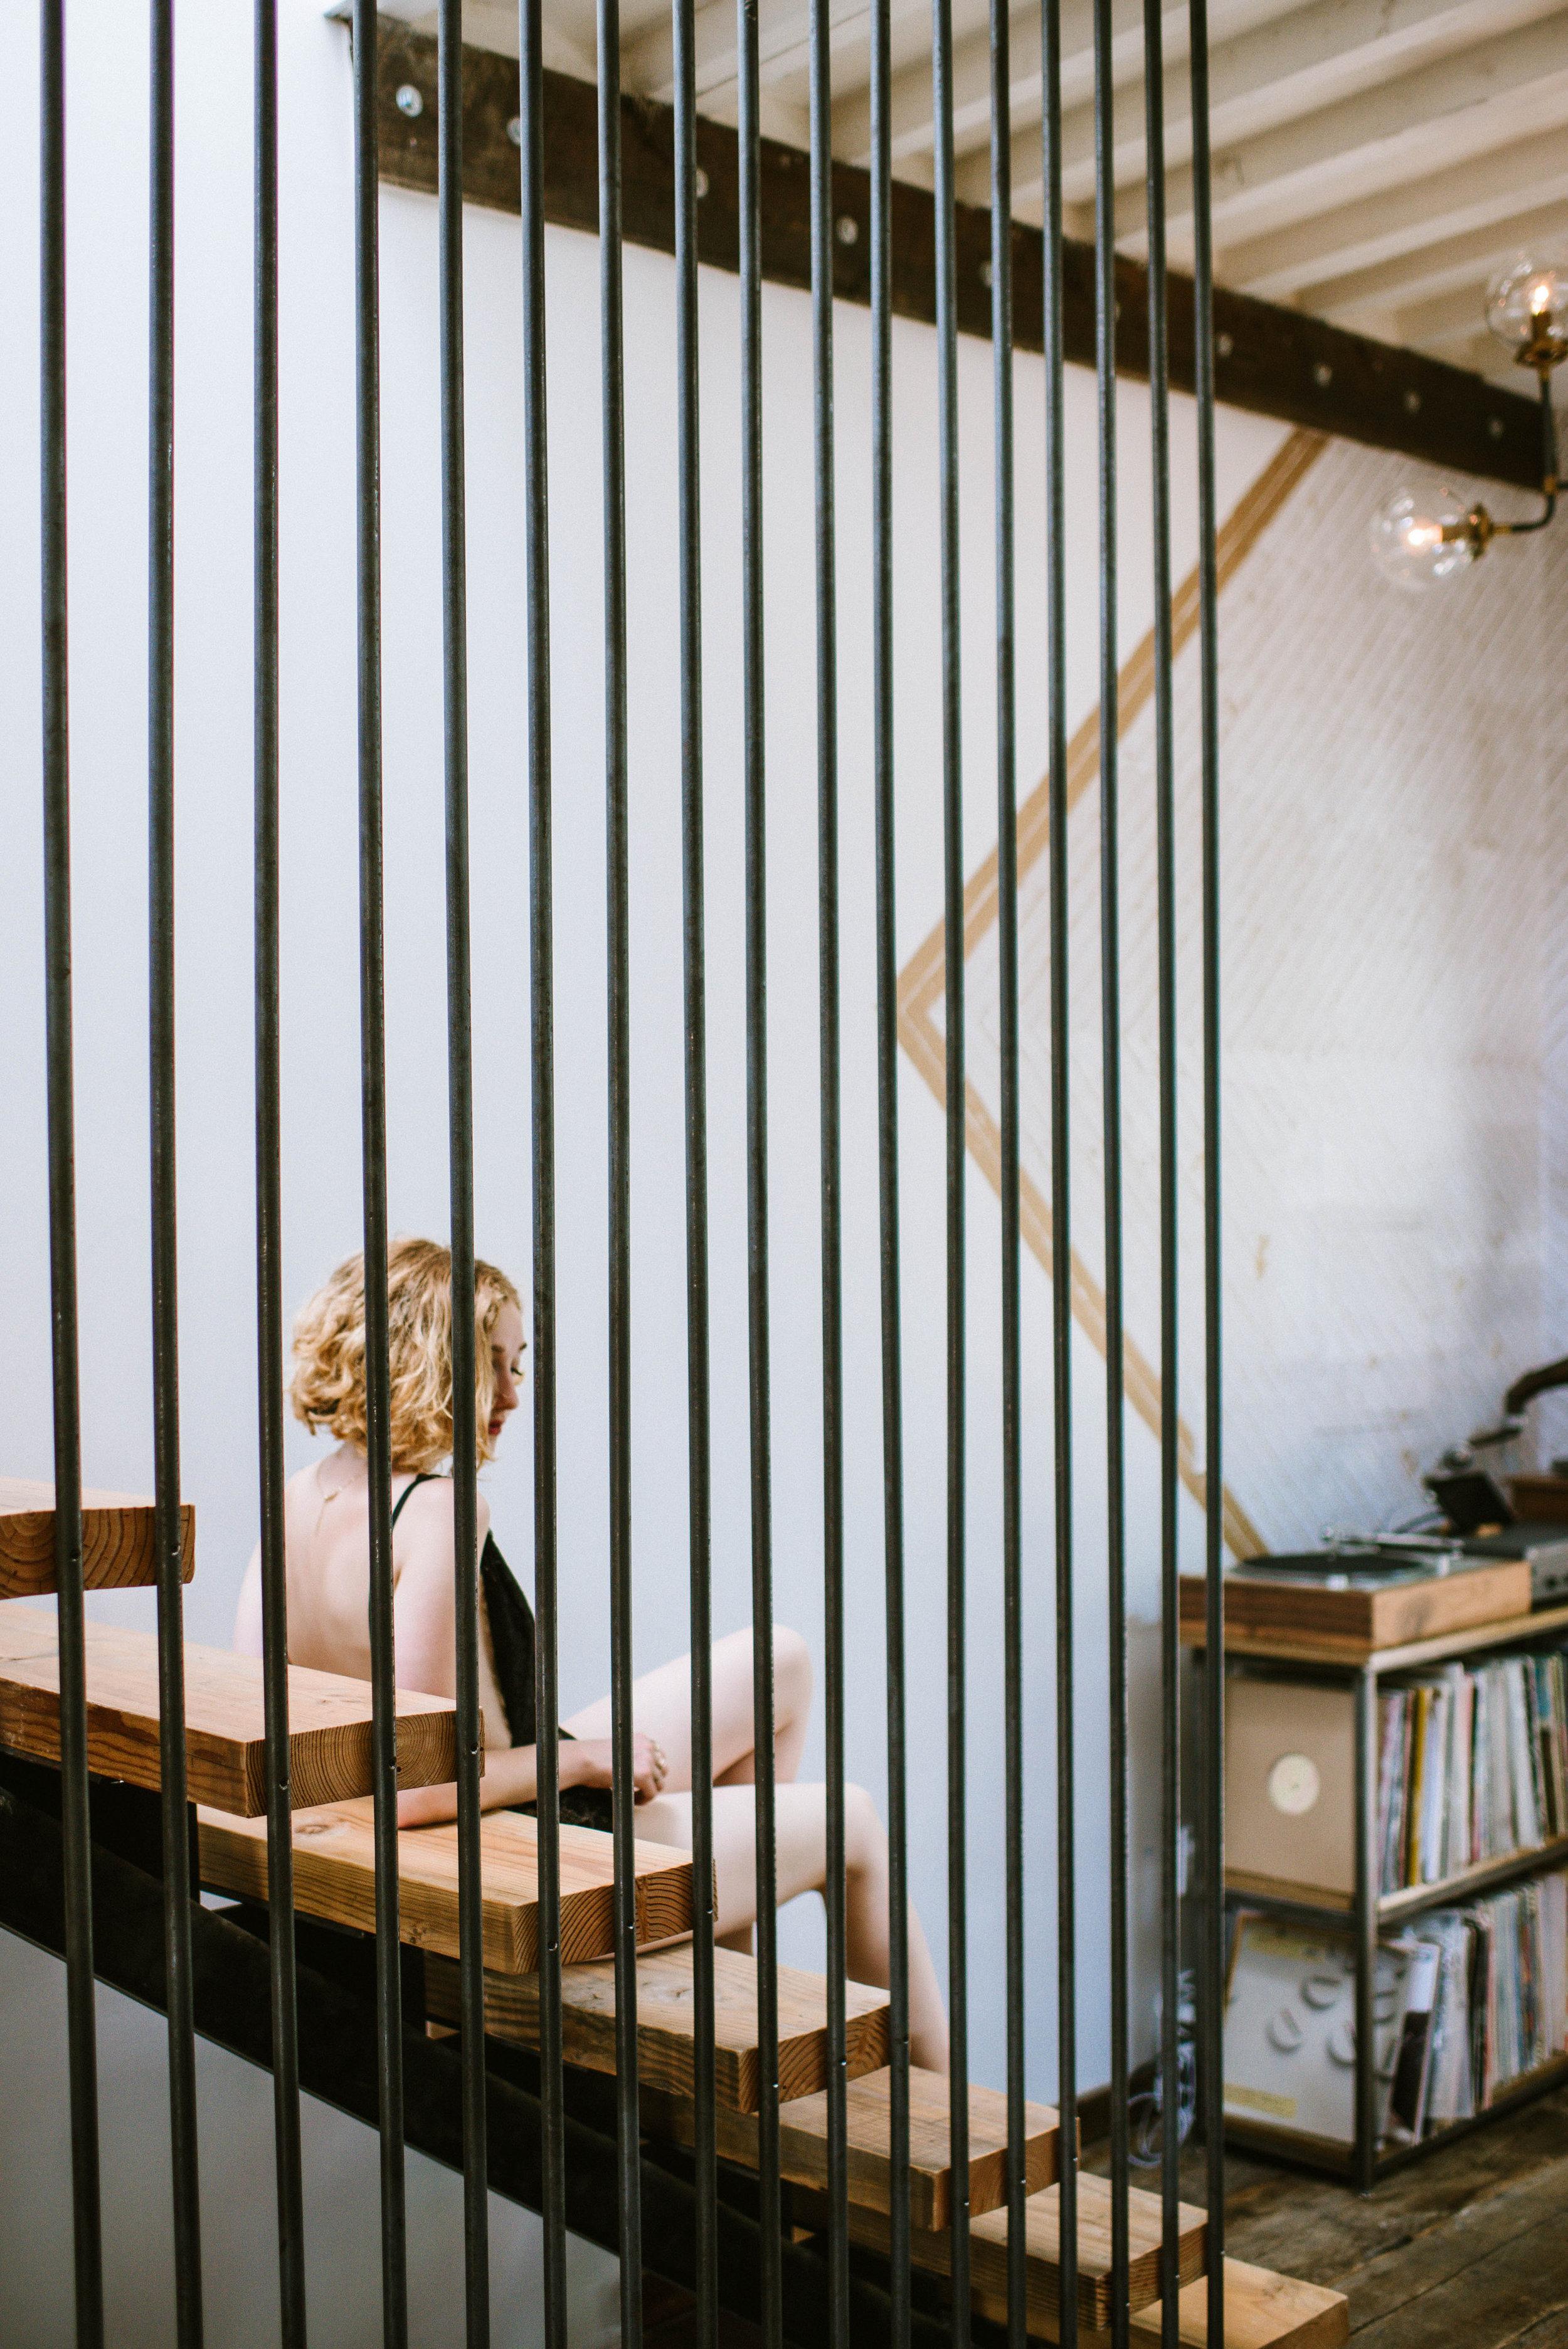 JulietteFashion©brianamoore-103.jpg